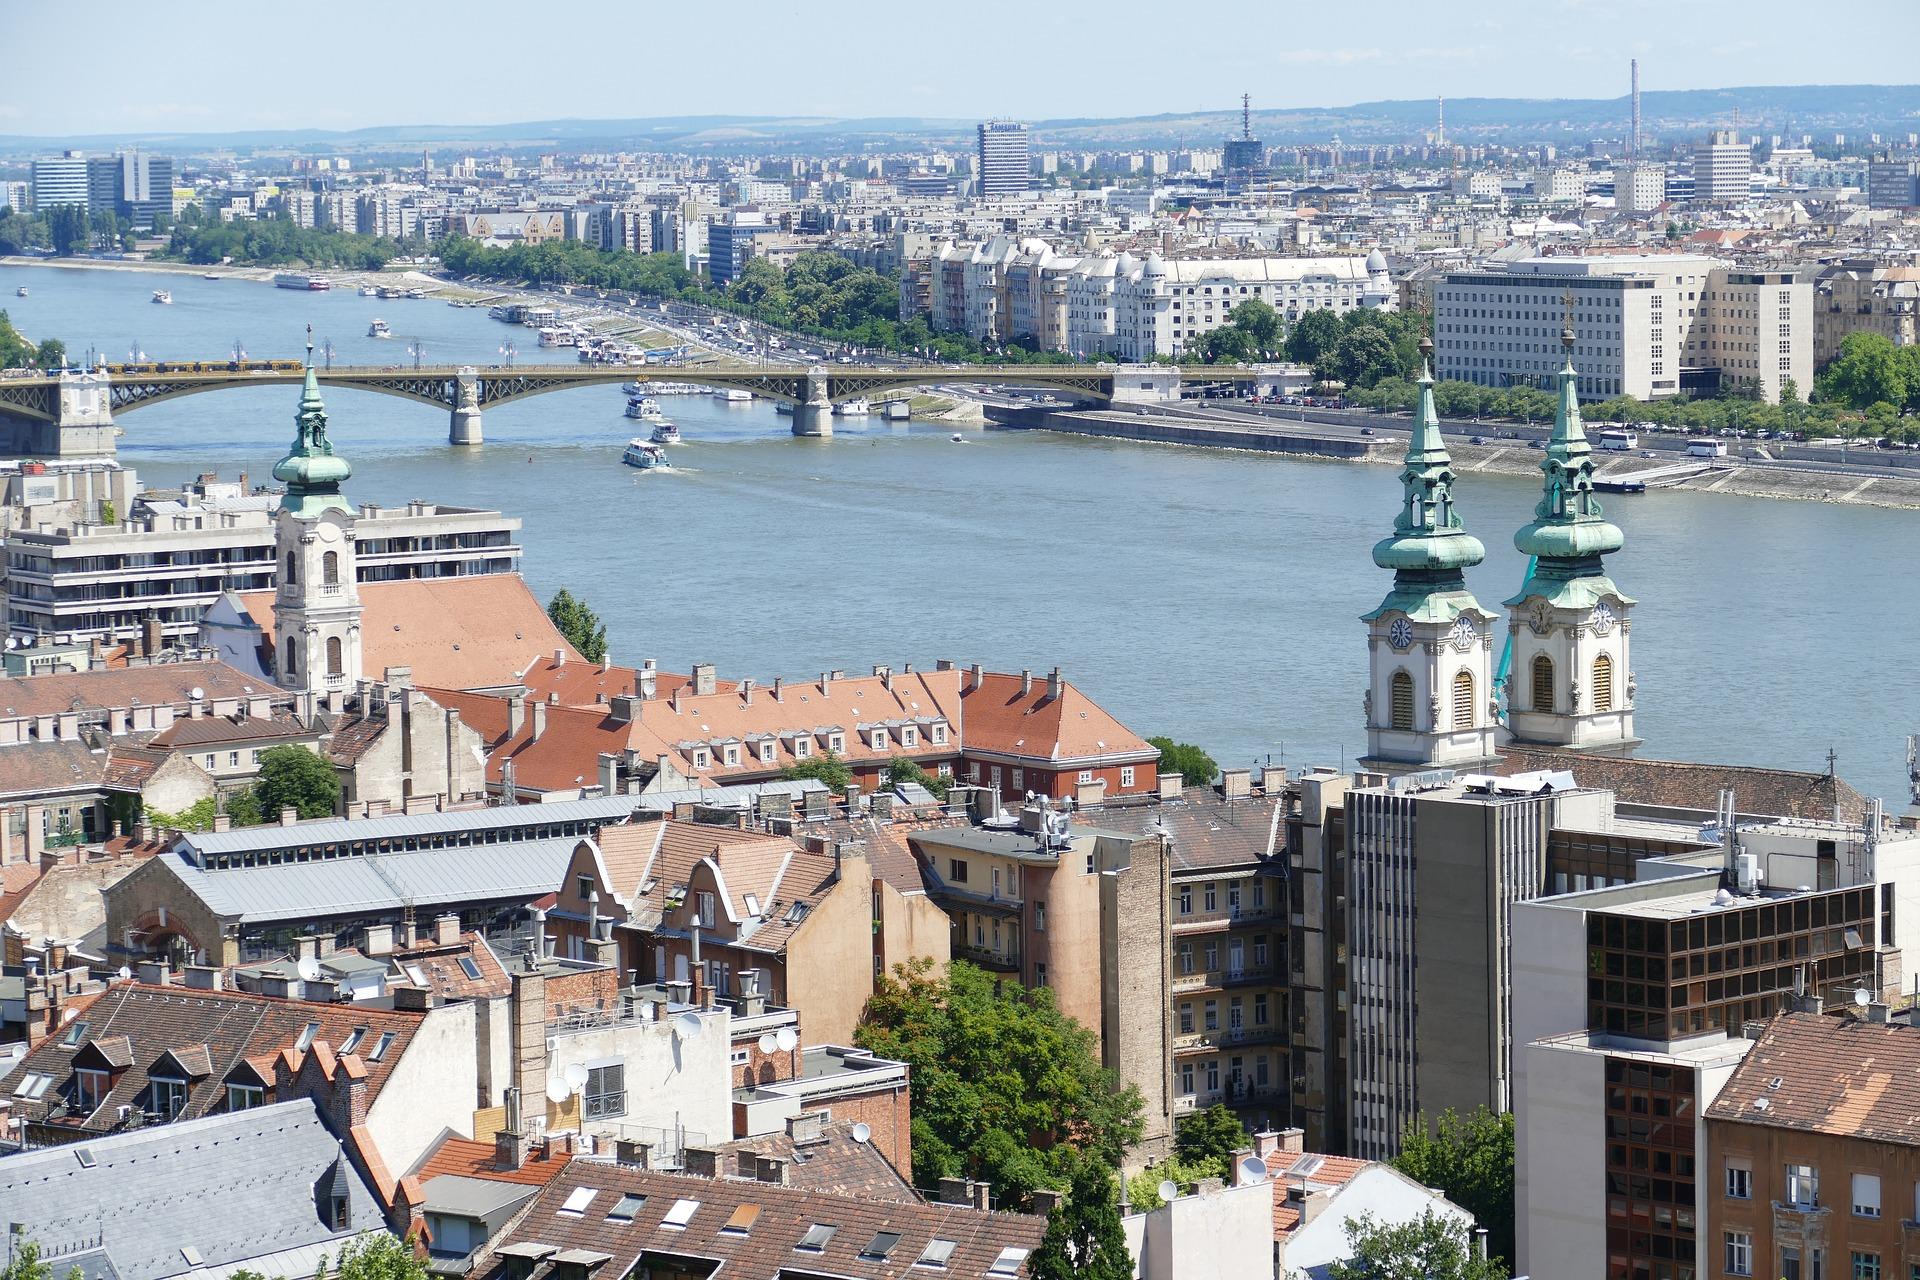 Budapest bridge and houses